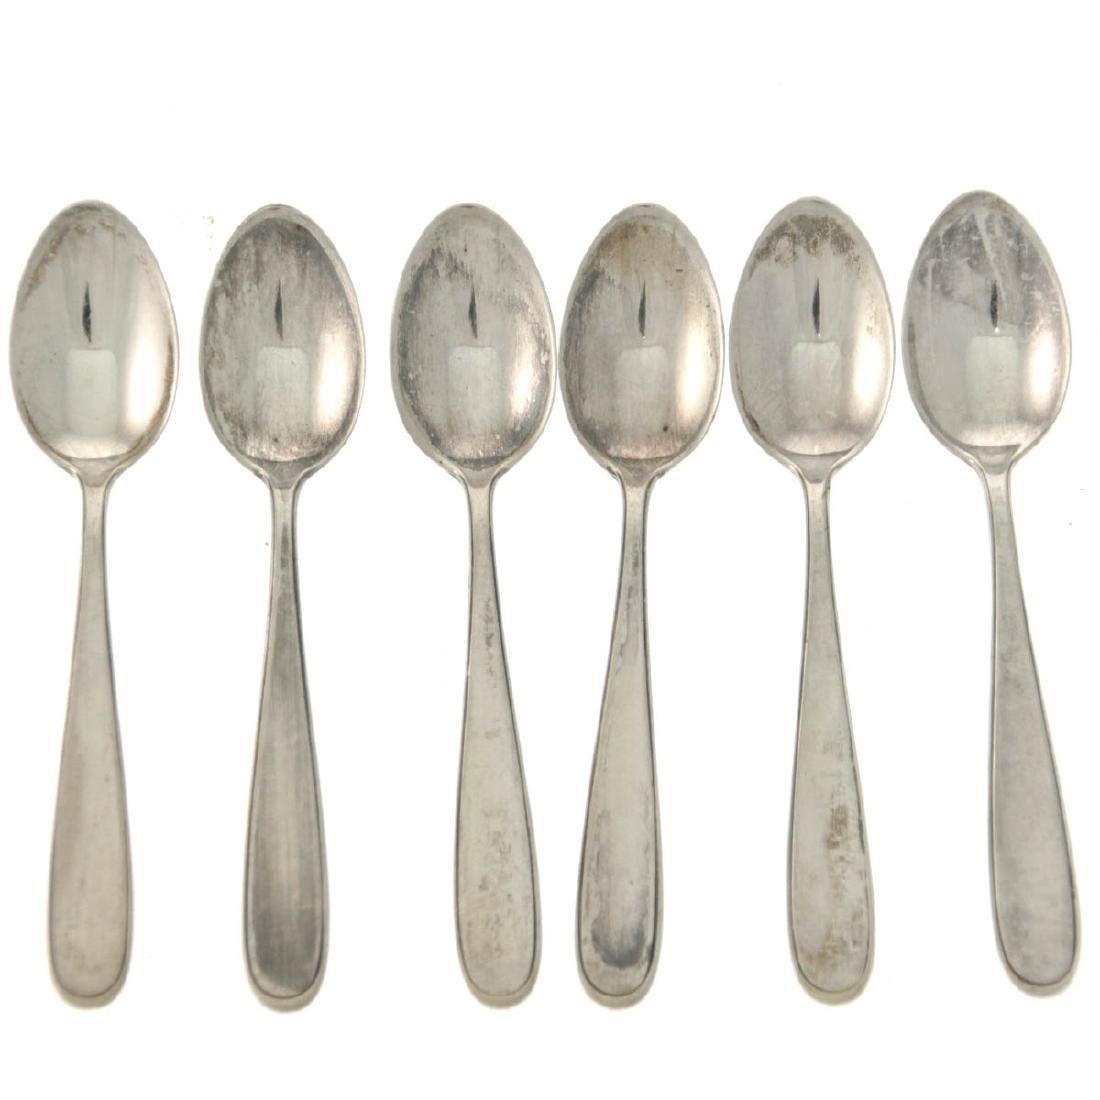 WMF Six Silver Teaspoons, Germany, Early 20th Century.